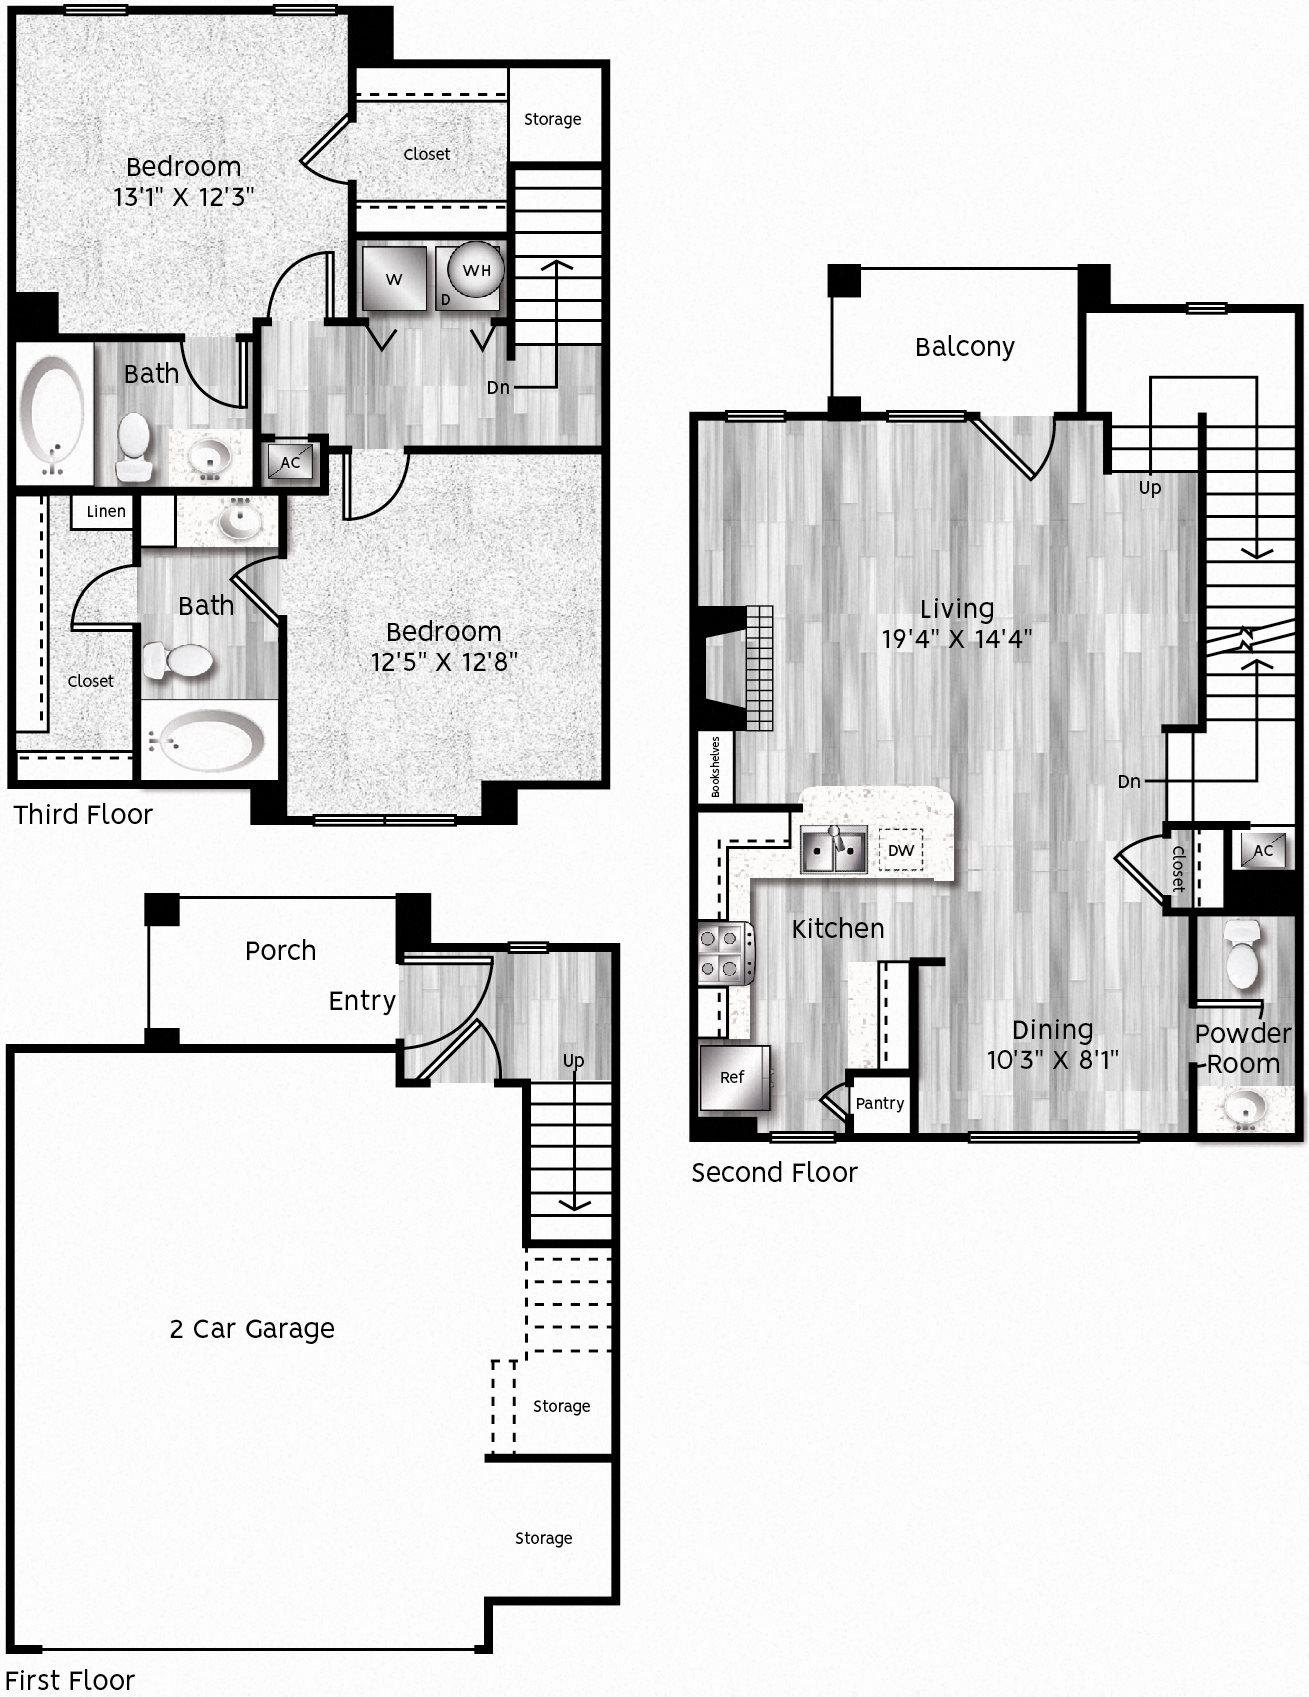 B4-LA 2 GARAGE Floor Plan 28